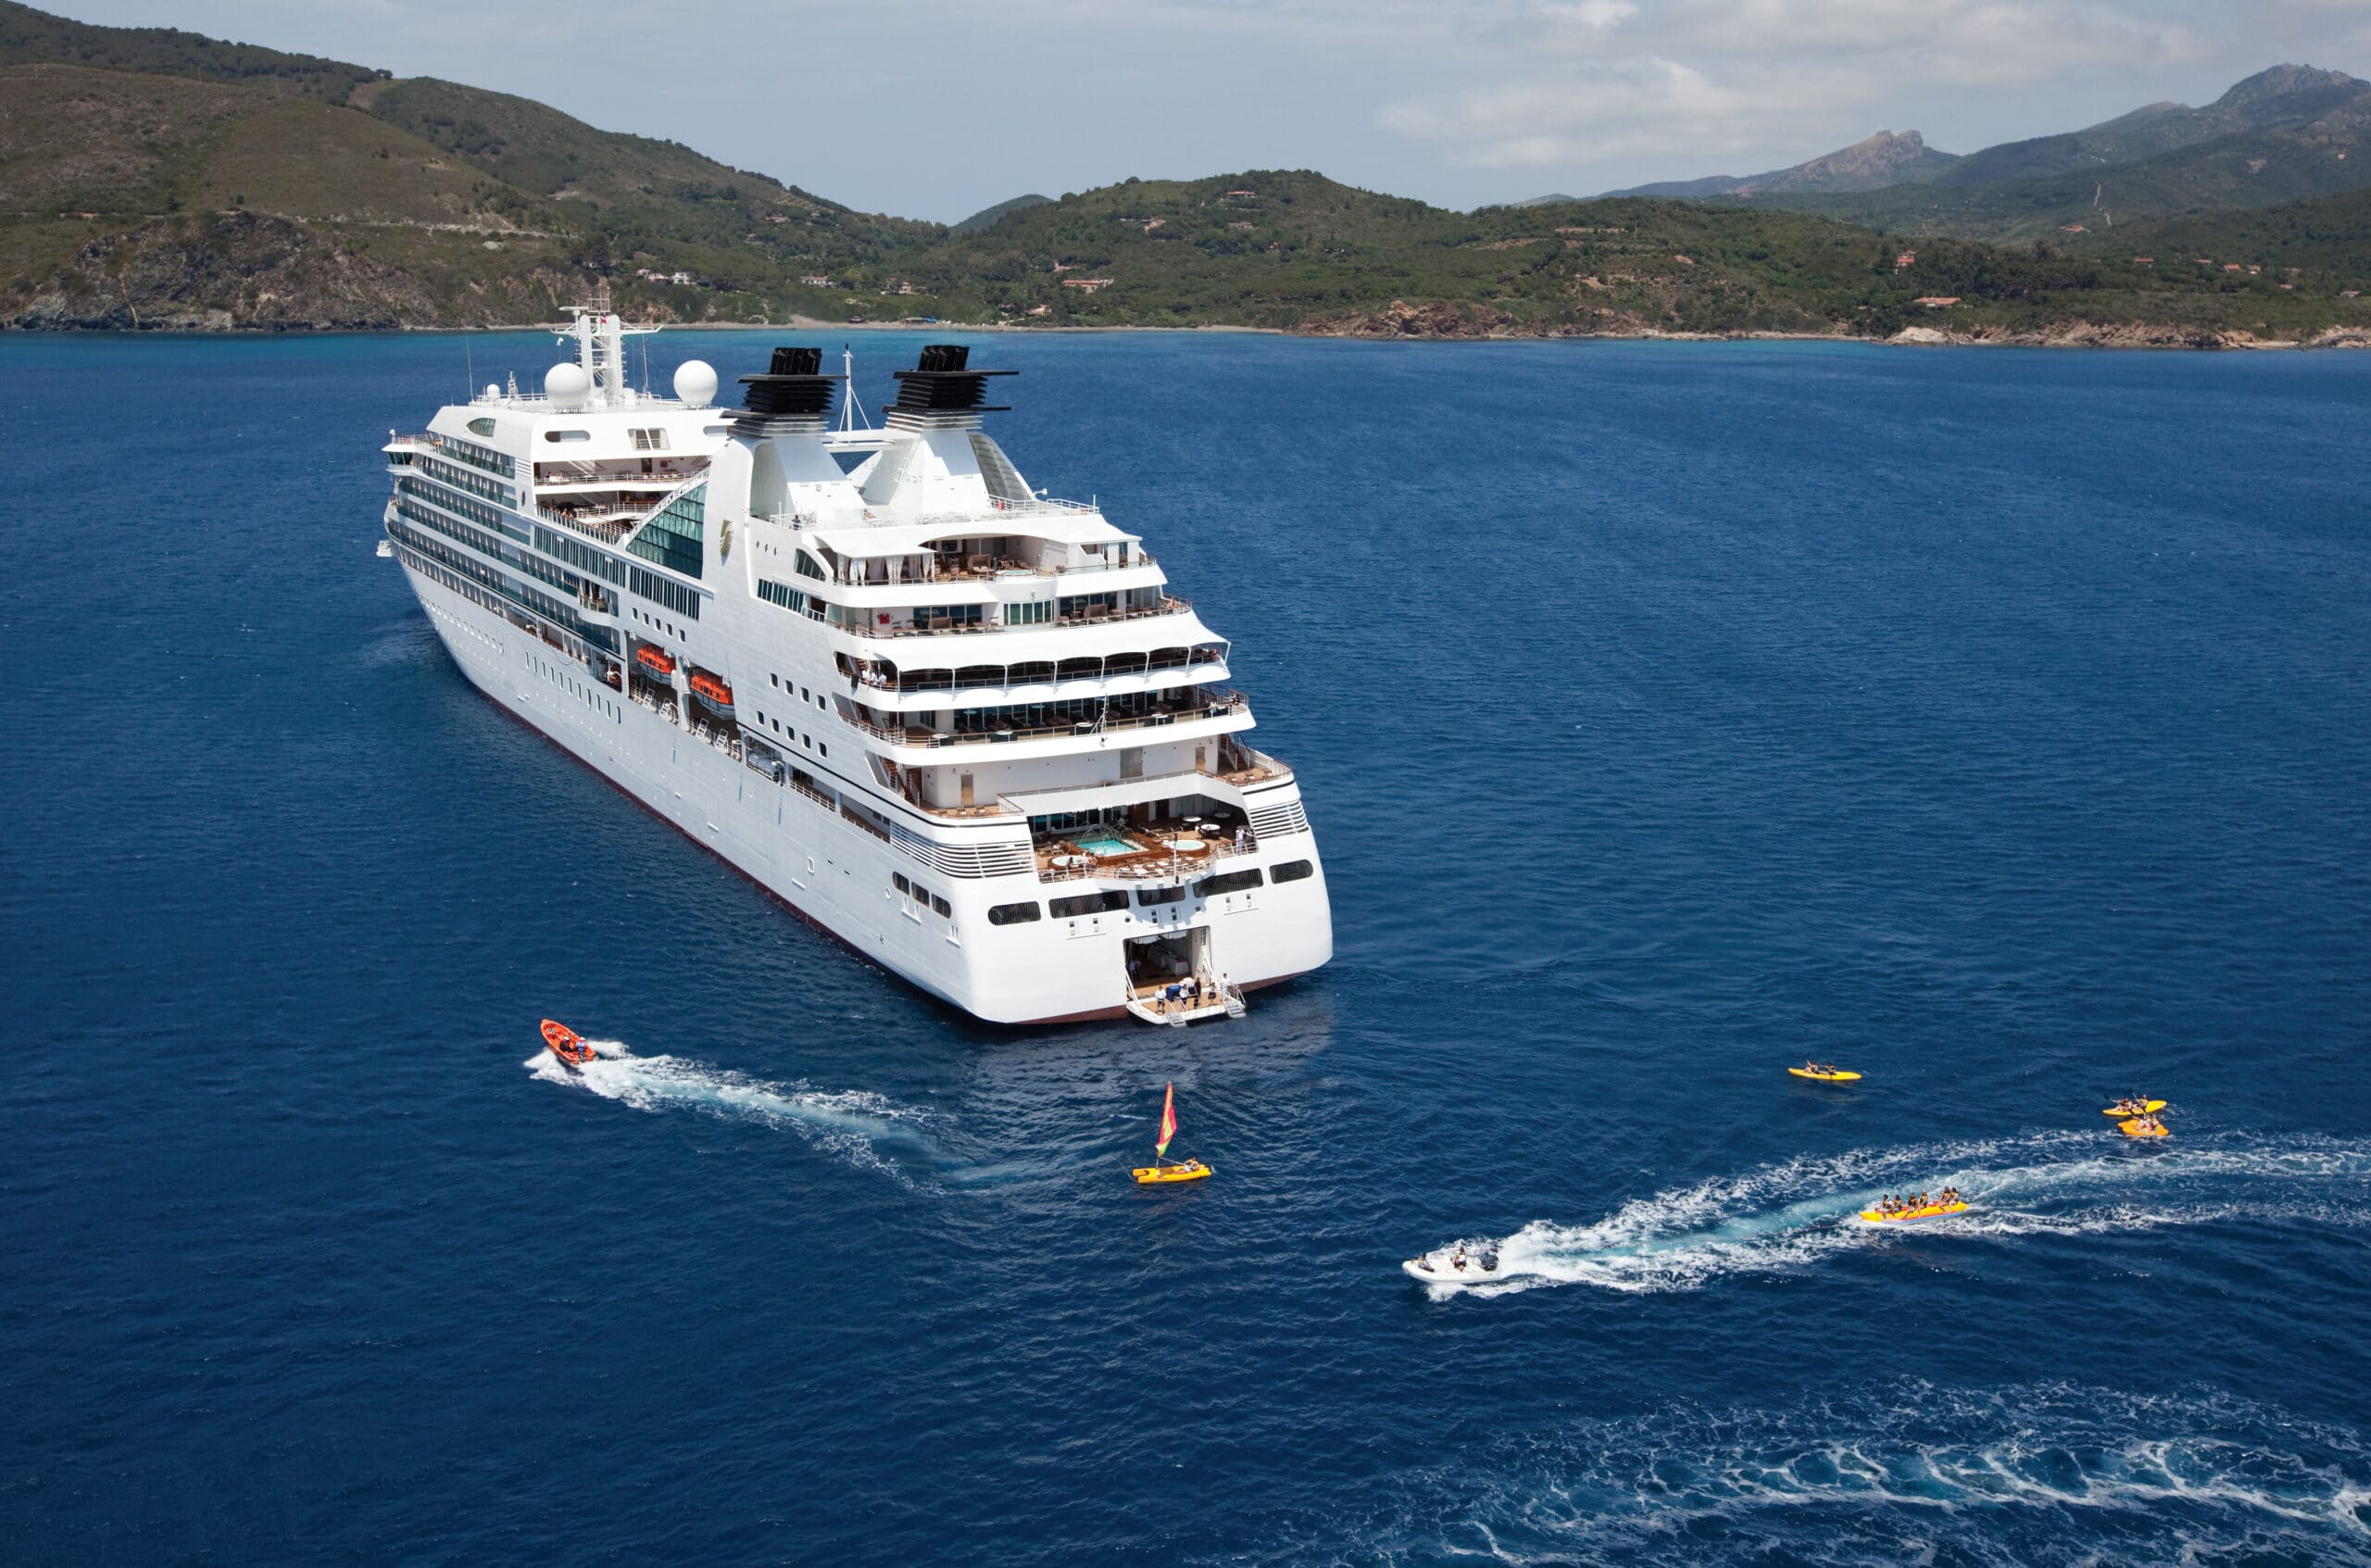 Cruiseschip-Seabourn Quest-Seabourn-Inspiratie